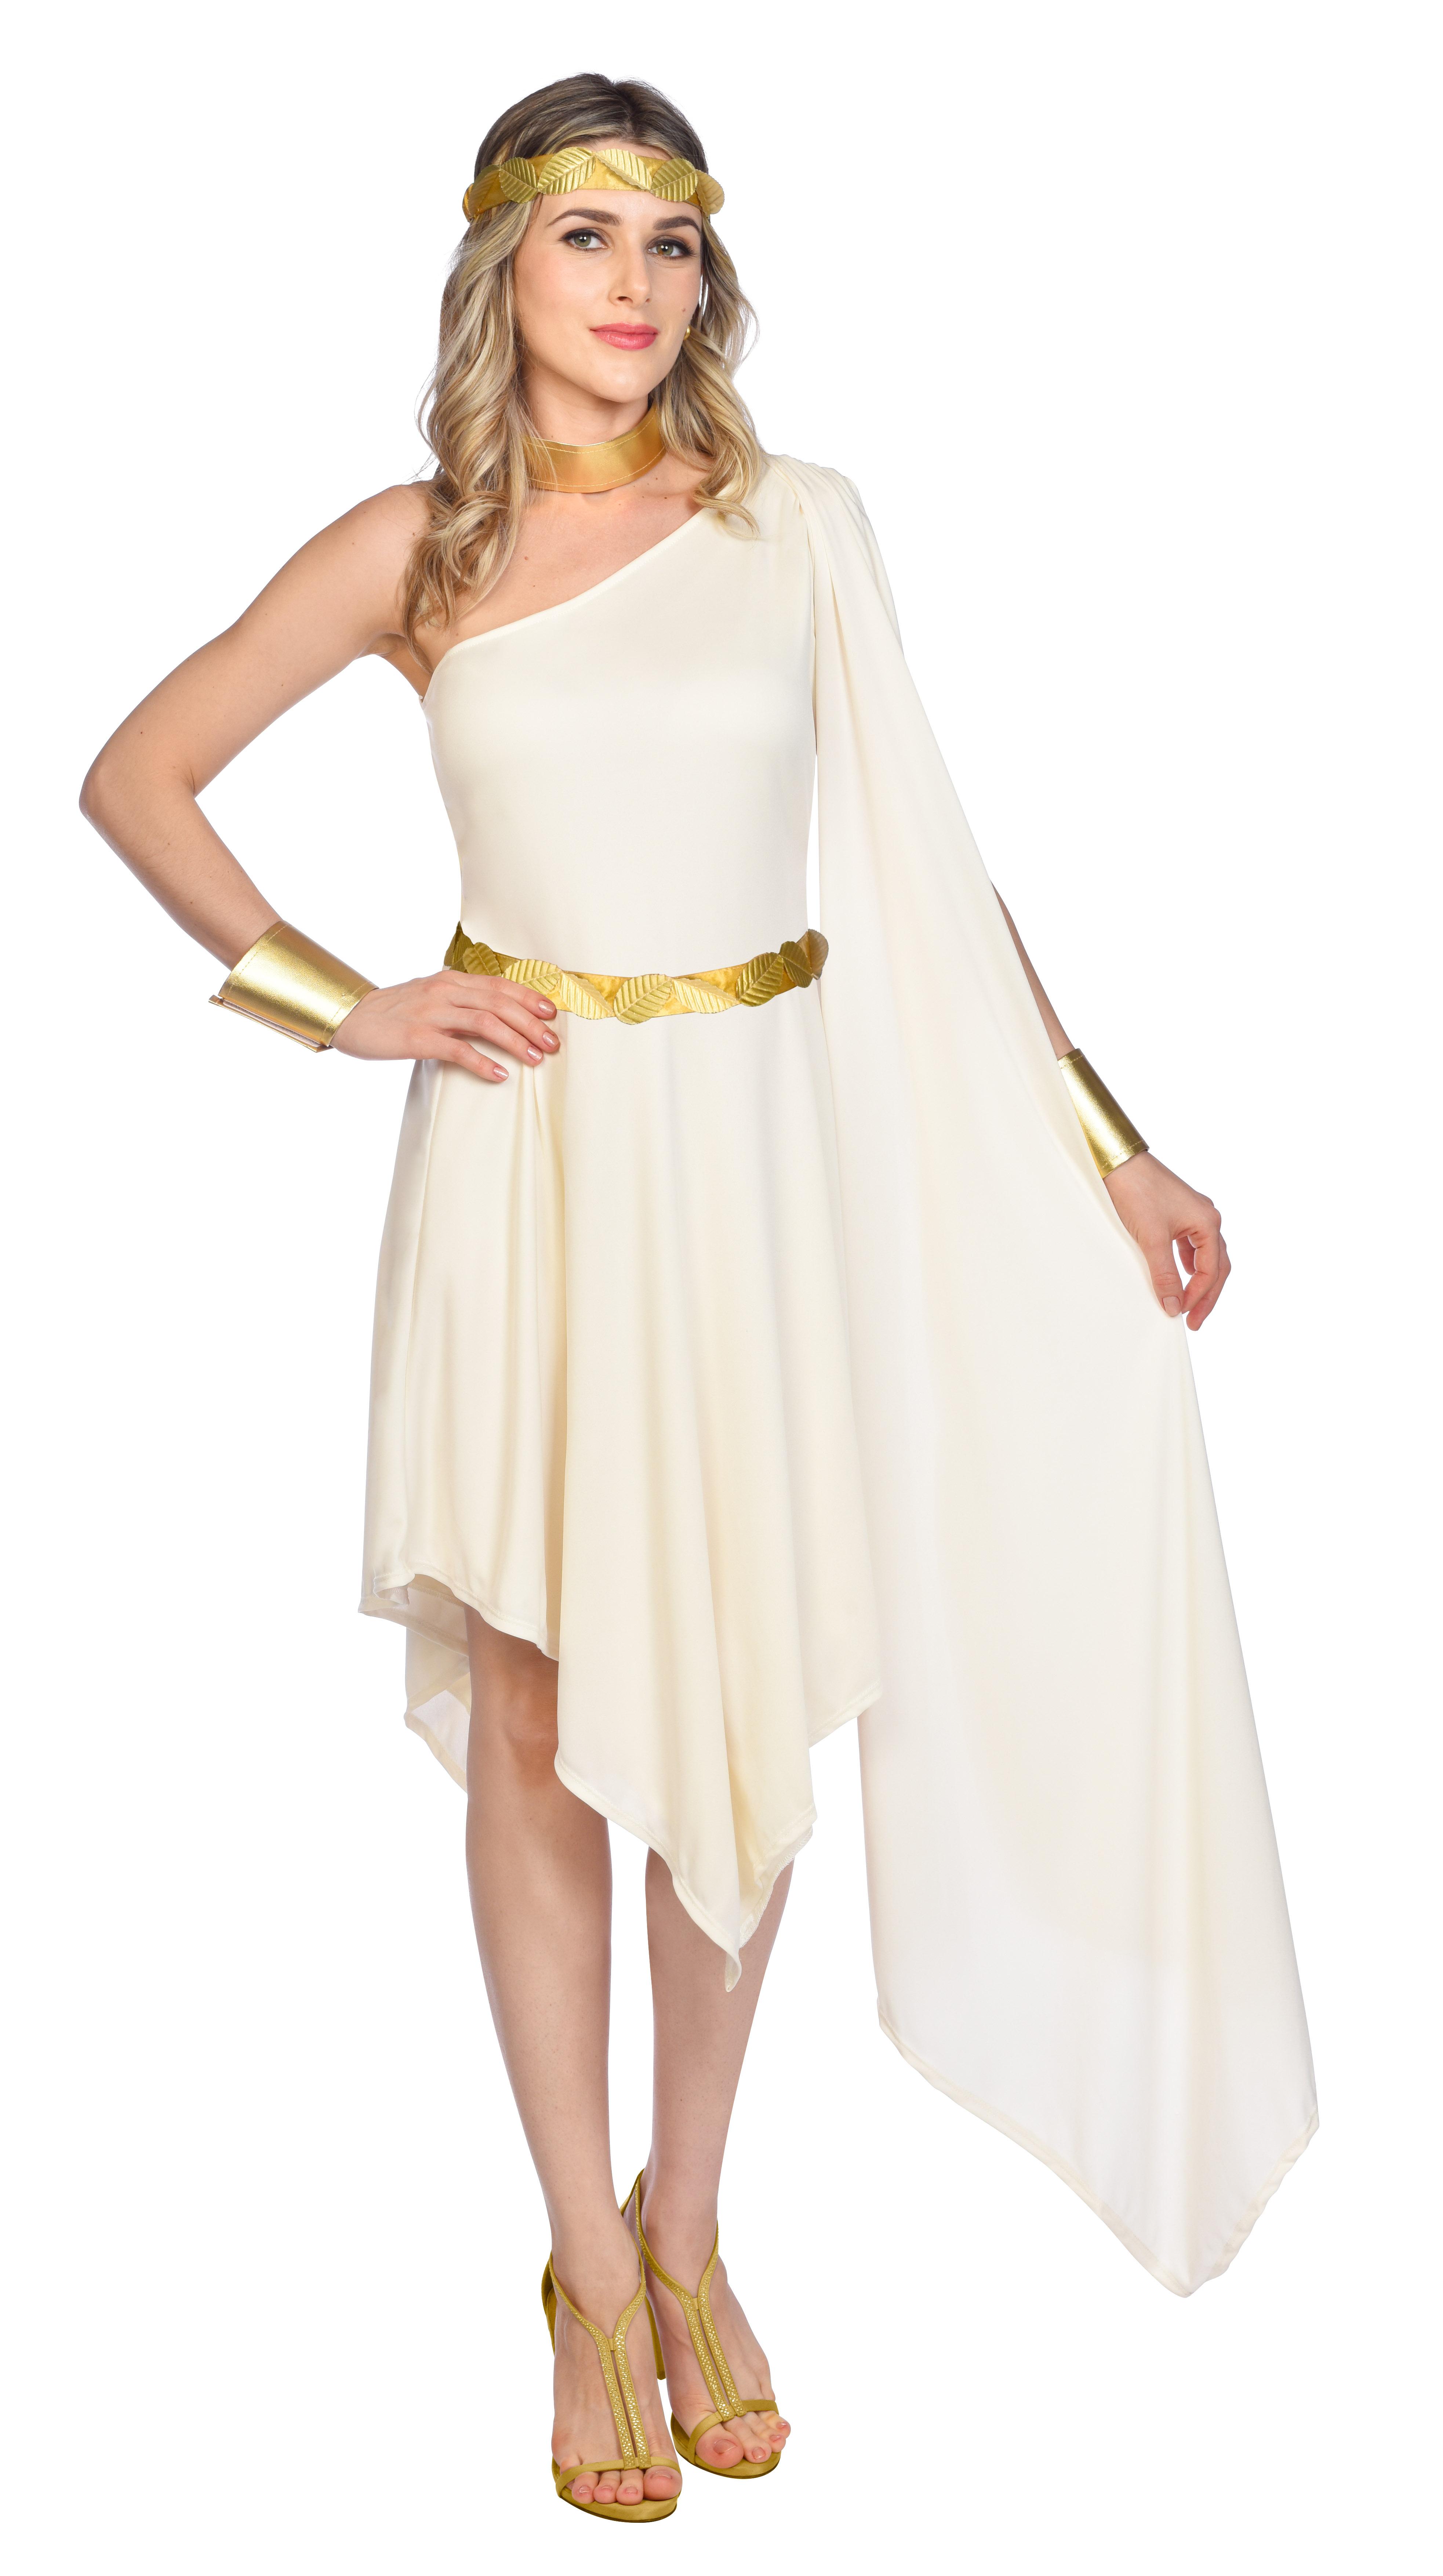 Indexbild 12 - Adult Ladies Golden Goddess Gladiator Greek Roman Toga Fancy Dress Costume New